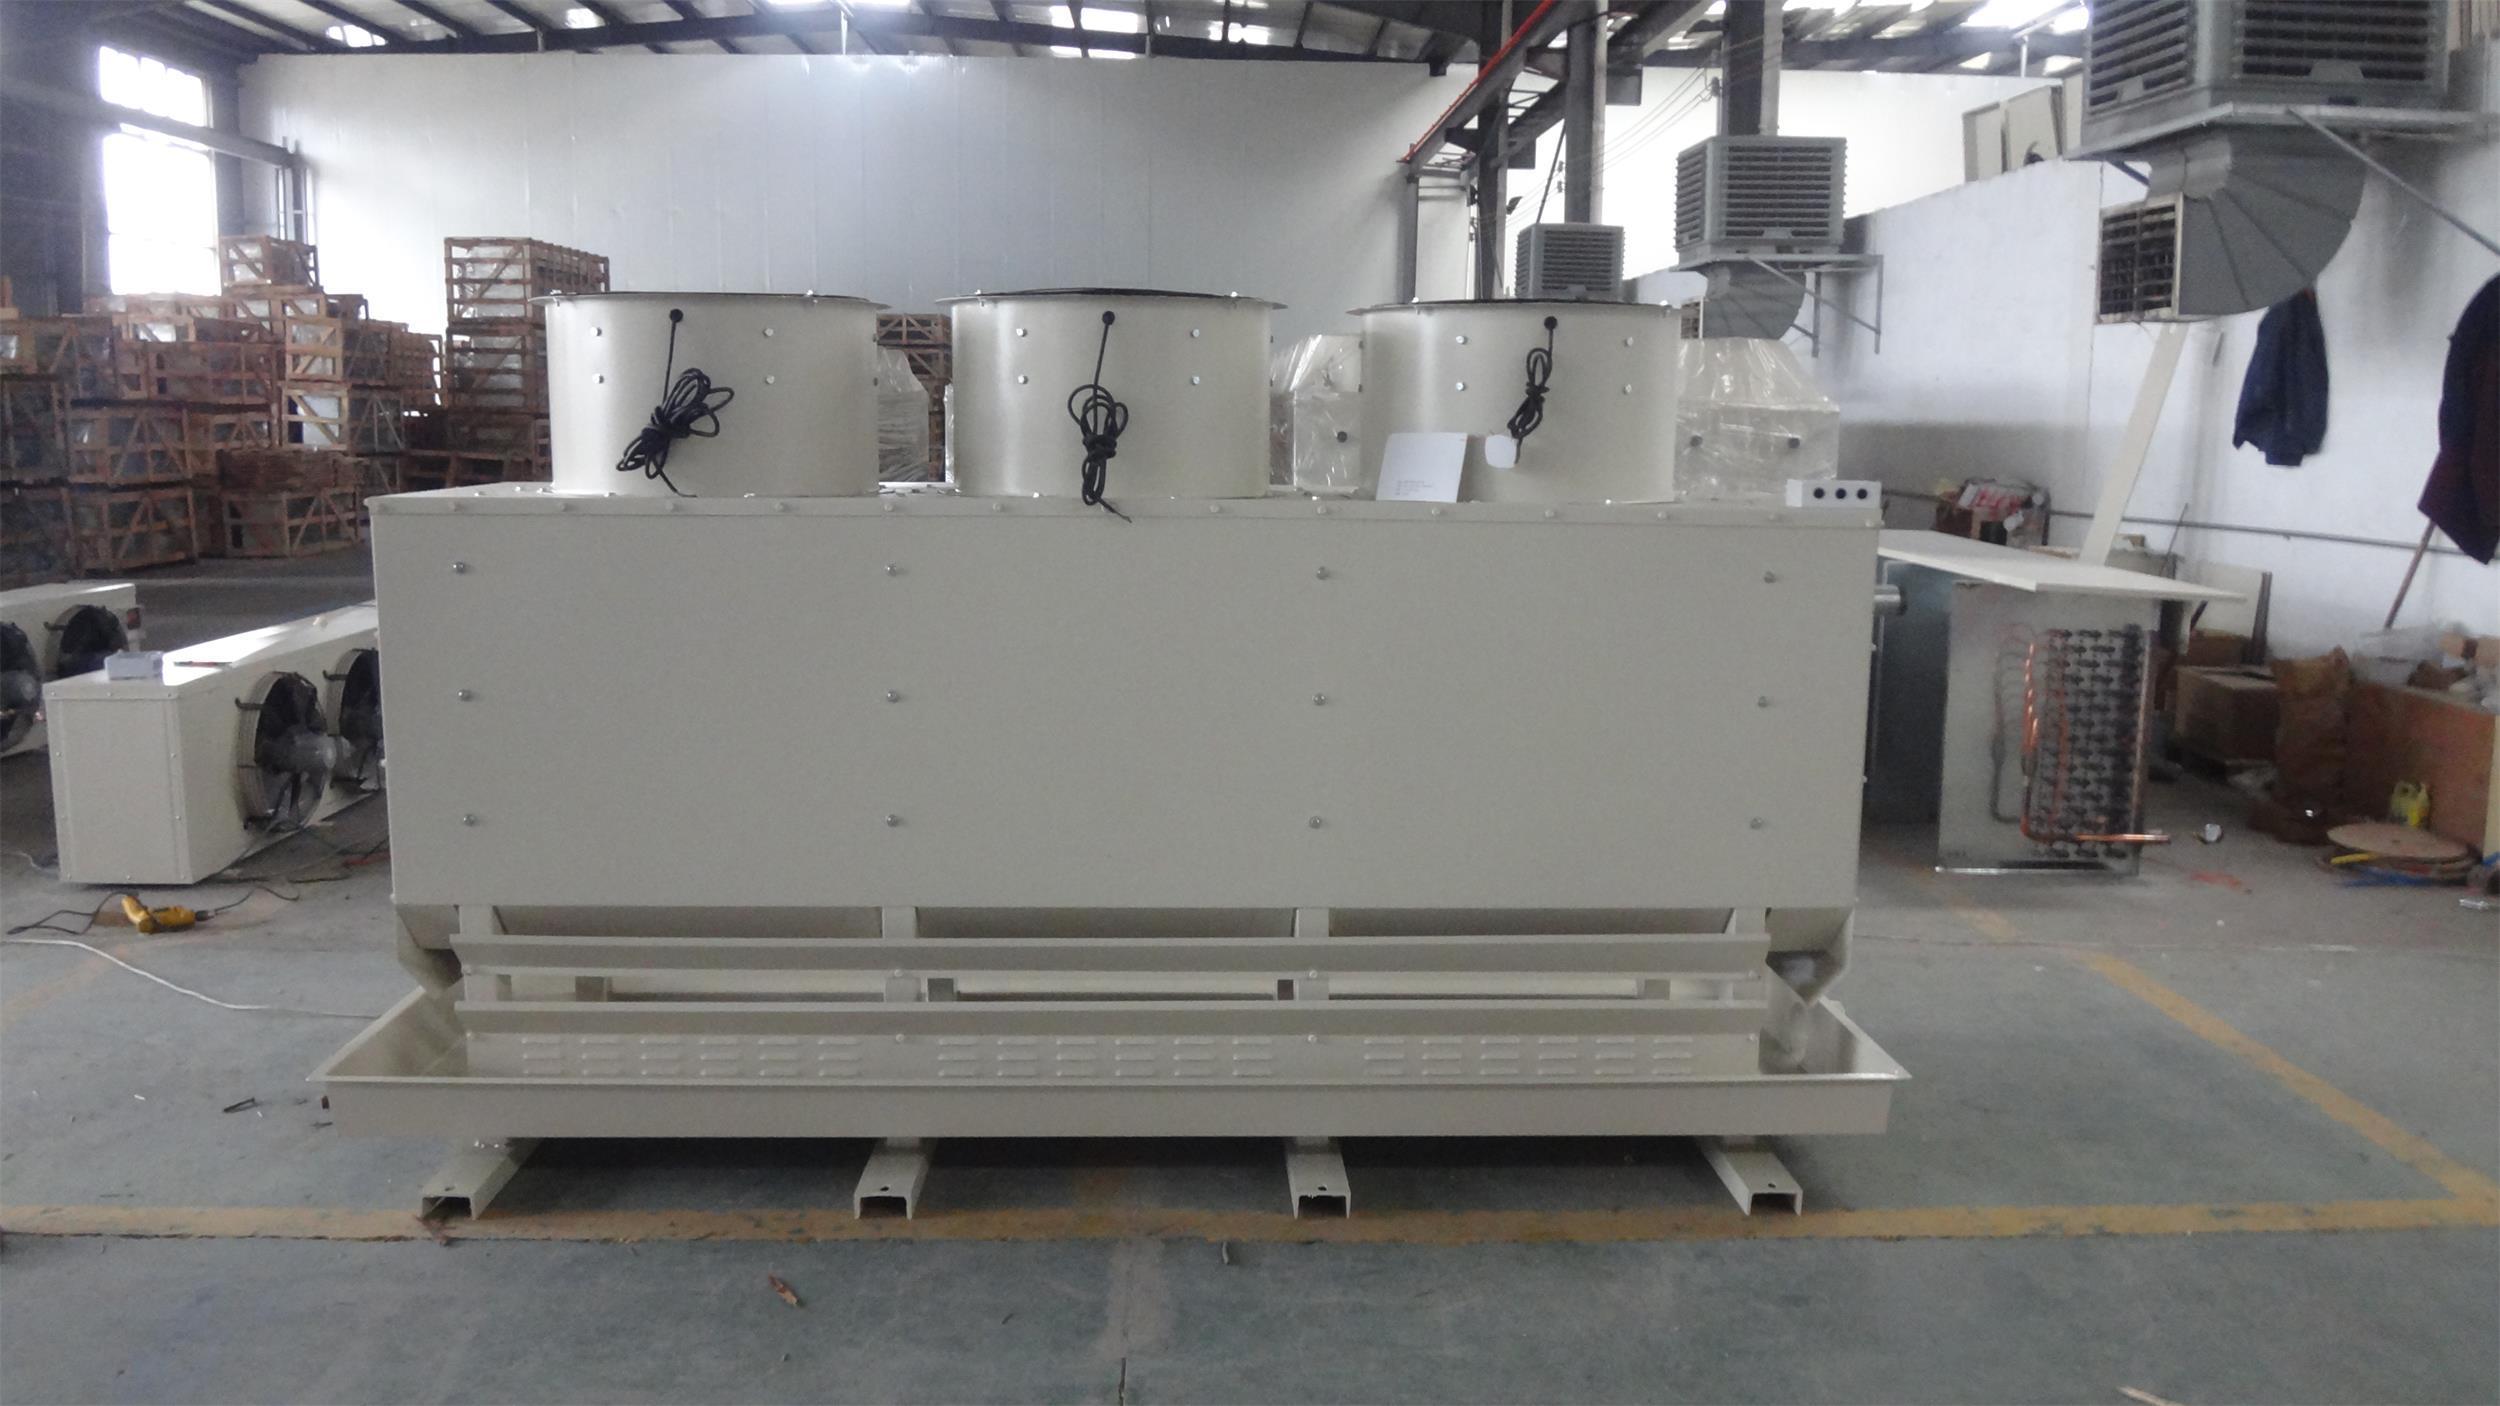 China Good Manufacturer Floor Stand Evaporative Air Cooler for Freezer Room